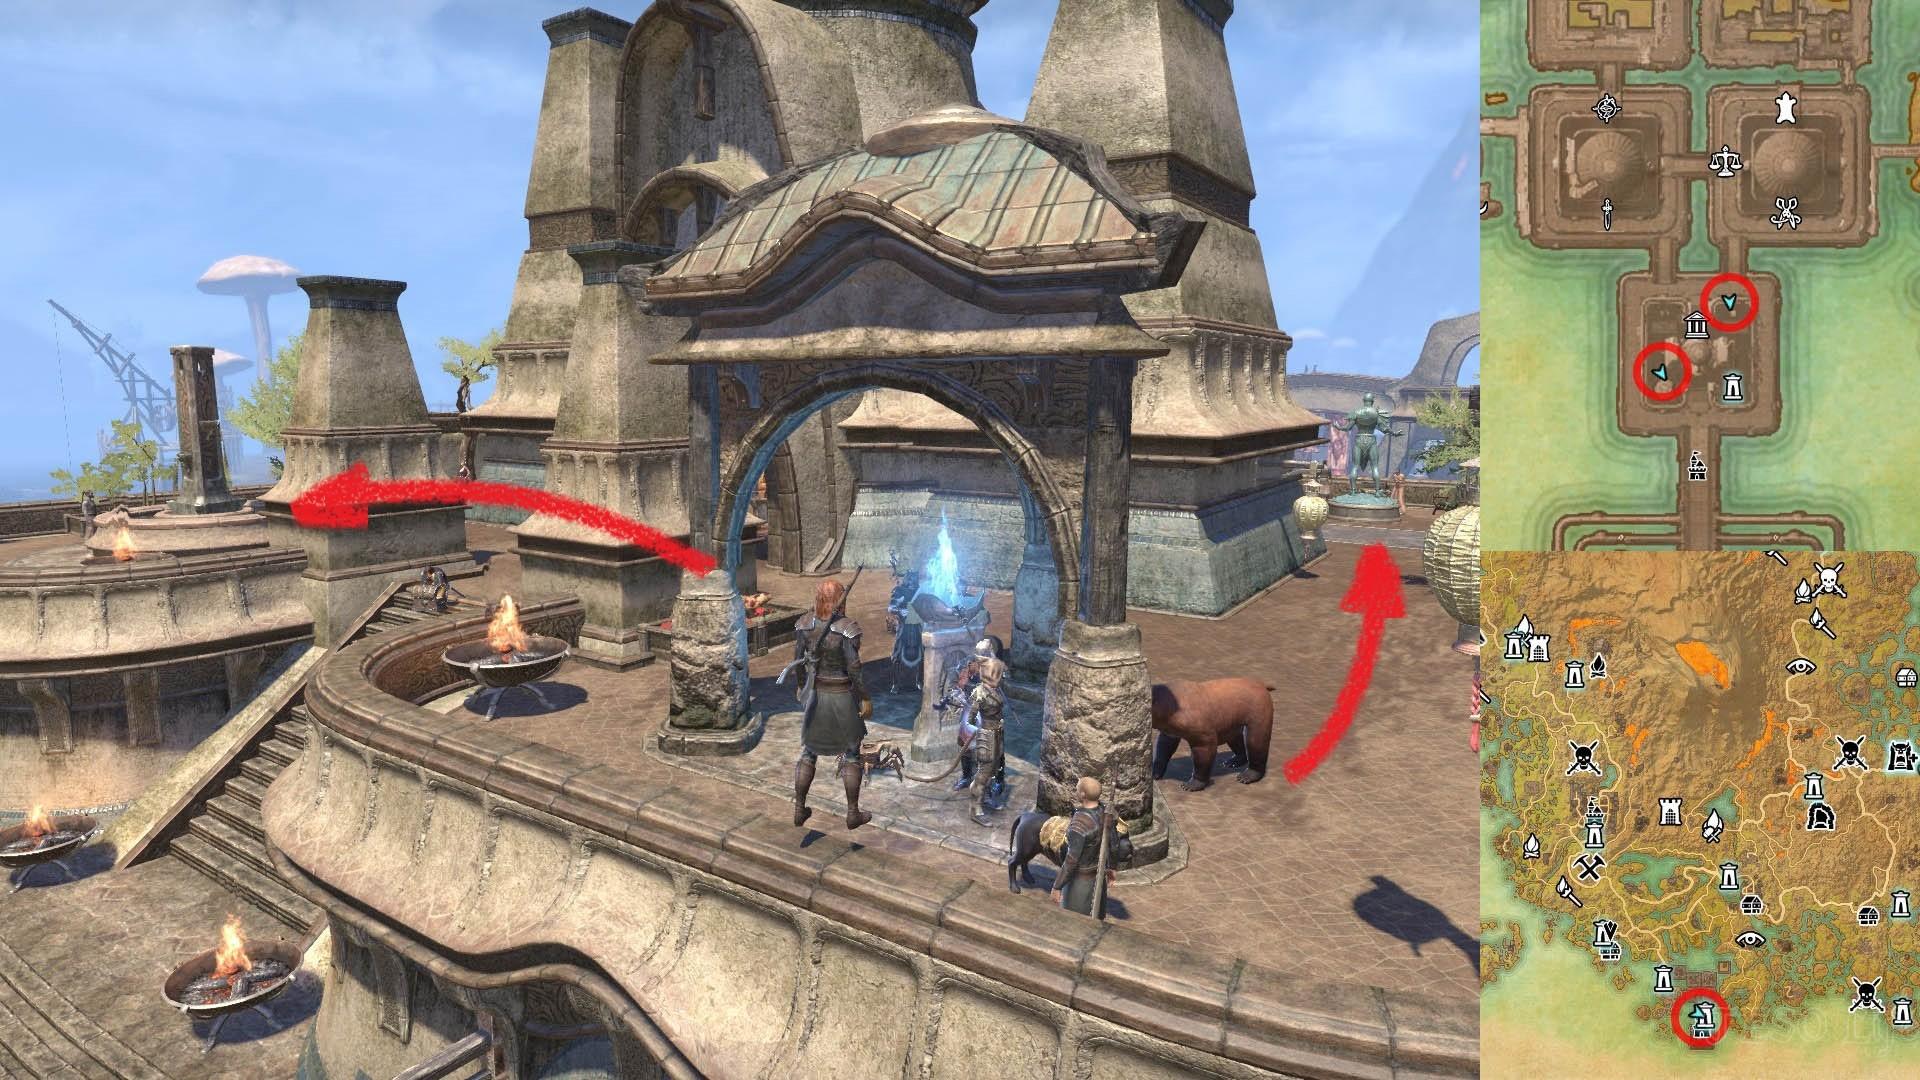 ESO Morrowind Shrine of Daring and Generosity